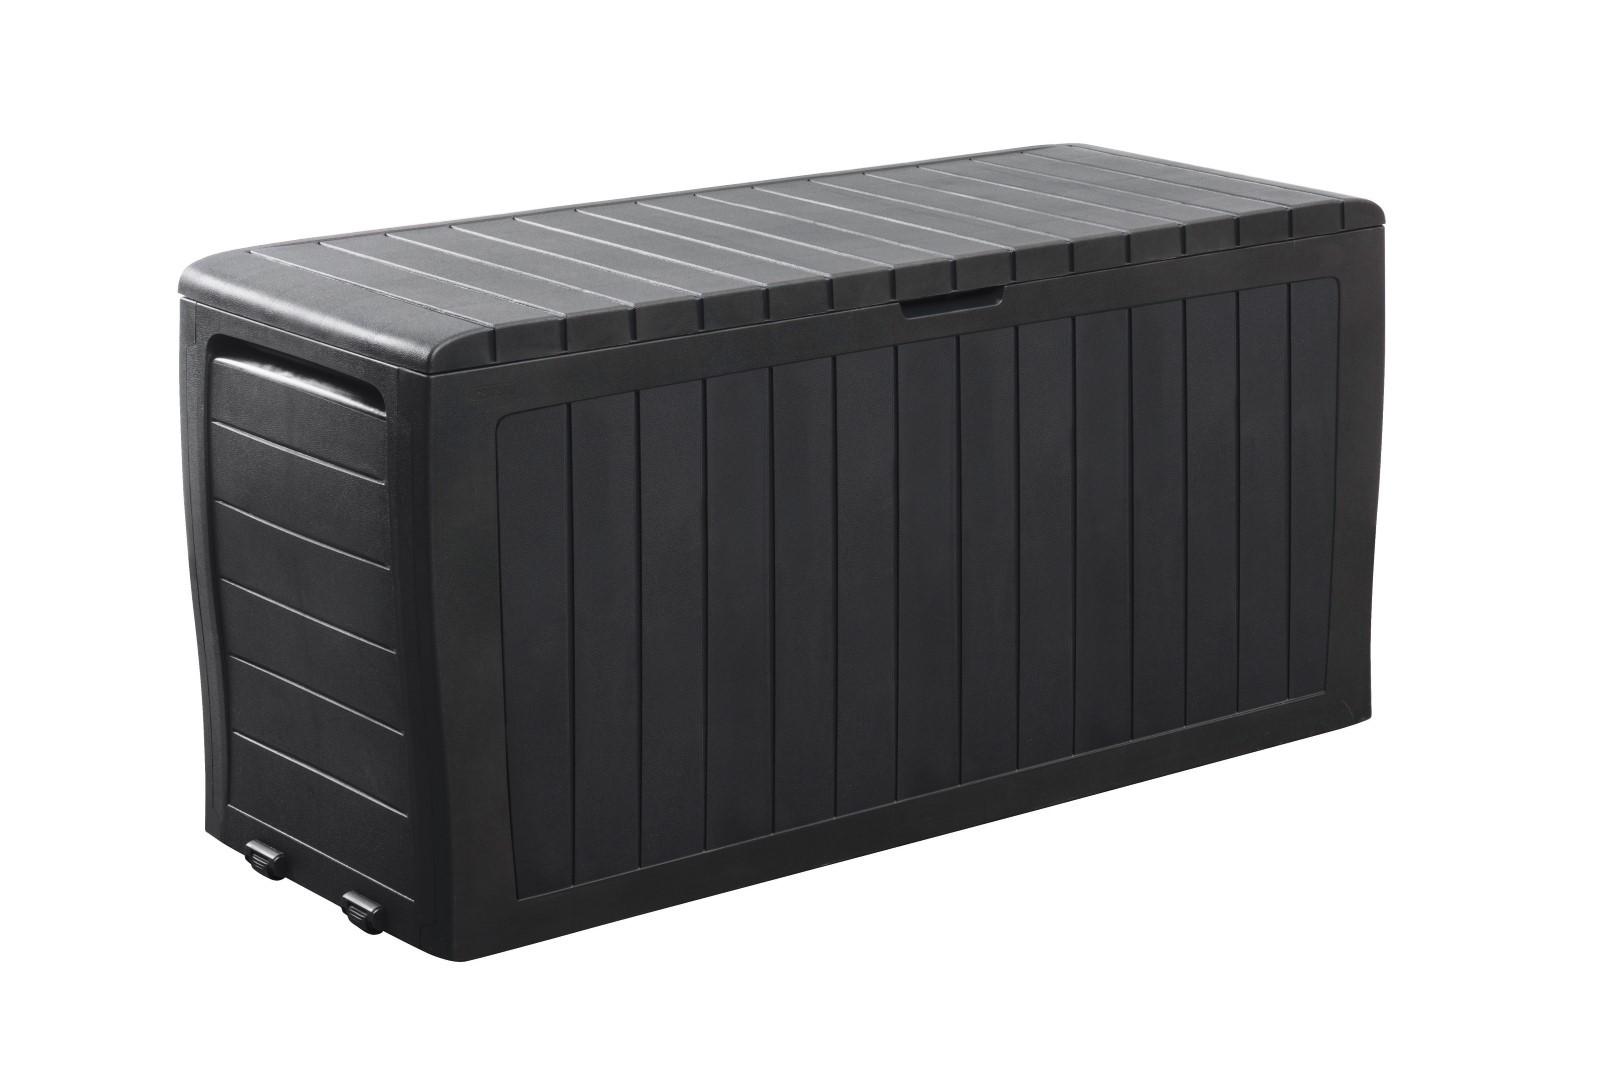 Marvel Plus box 270 liter